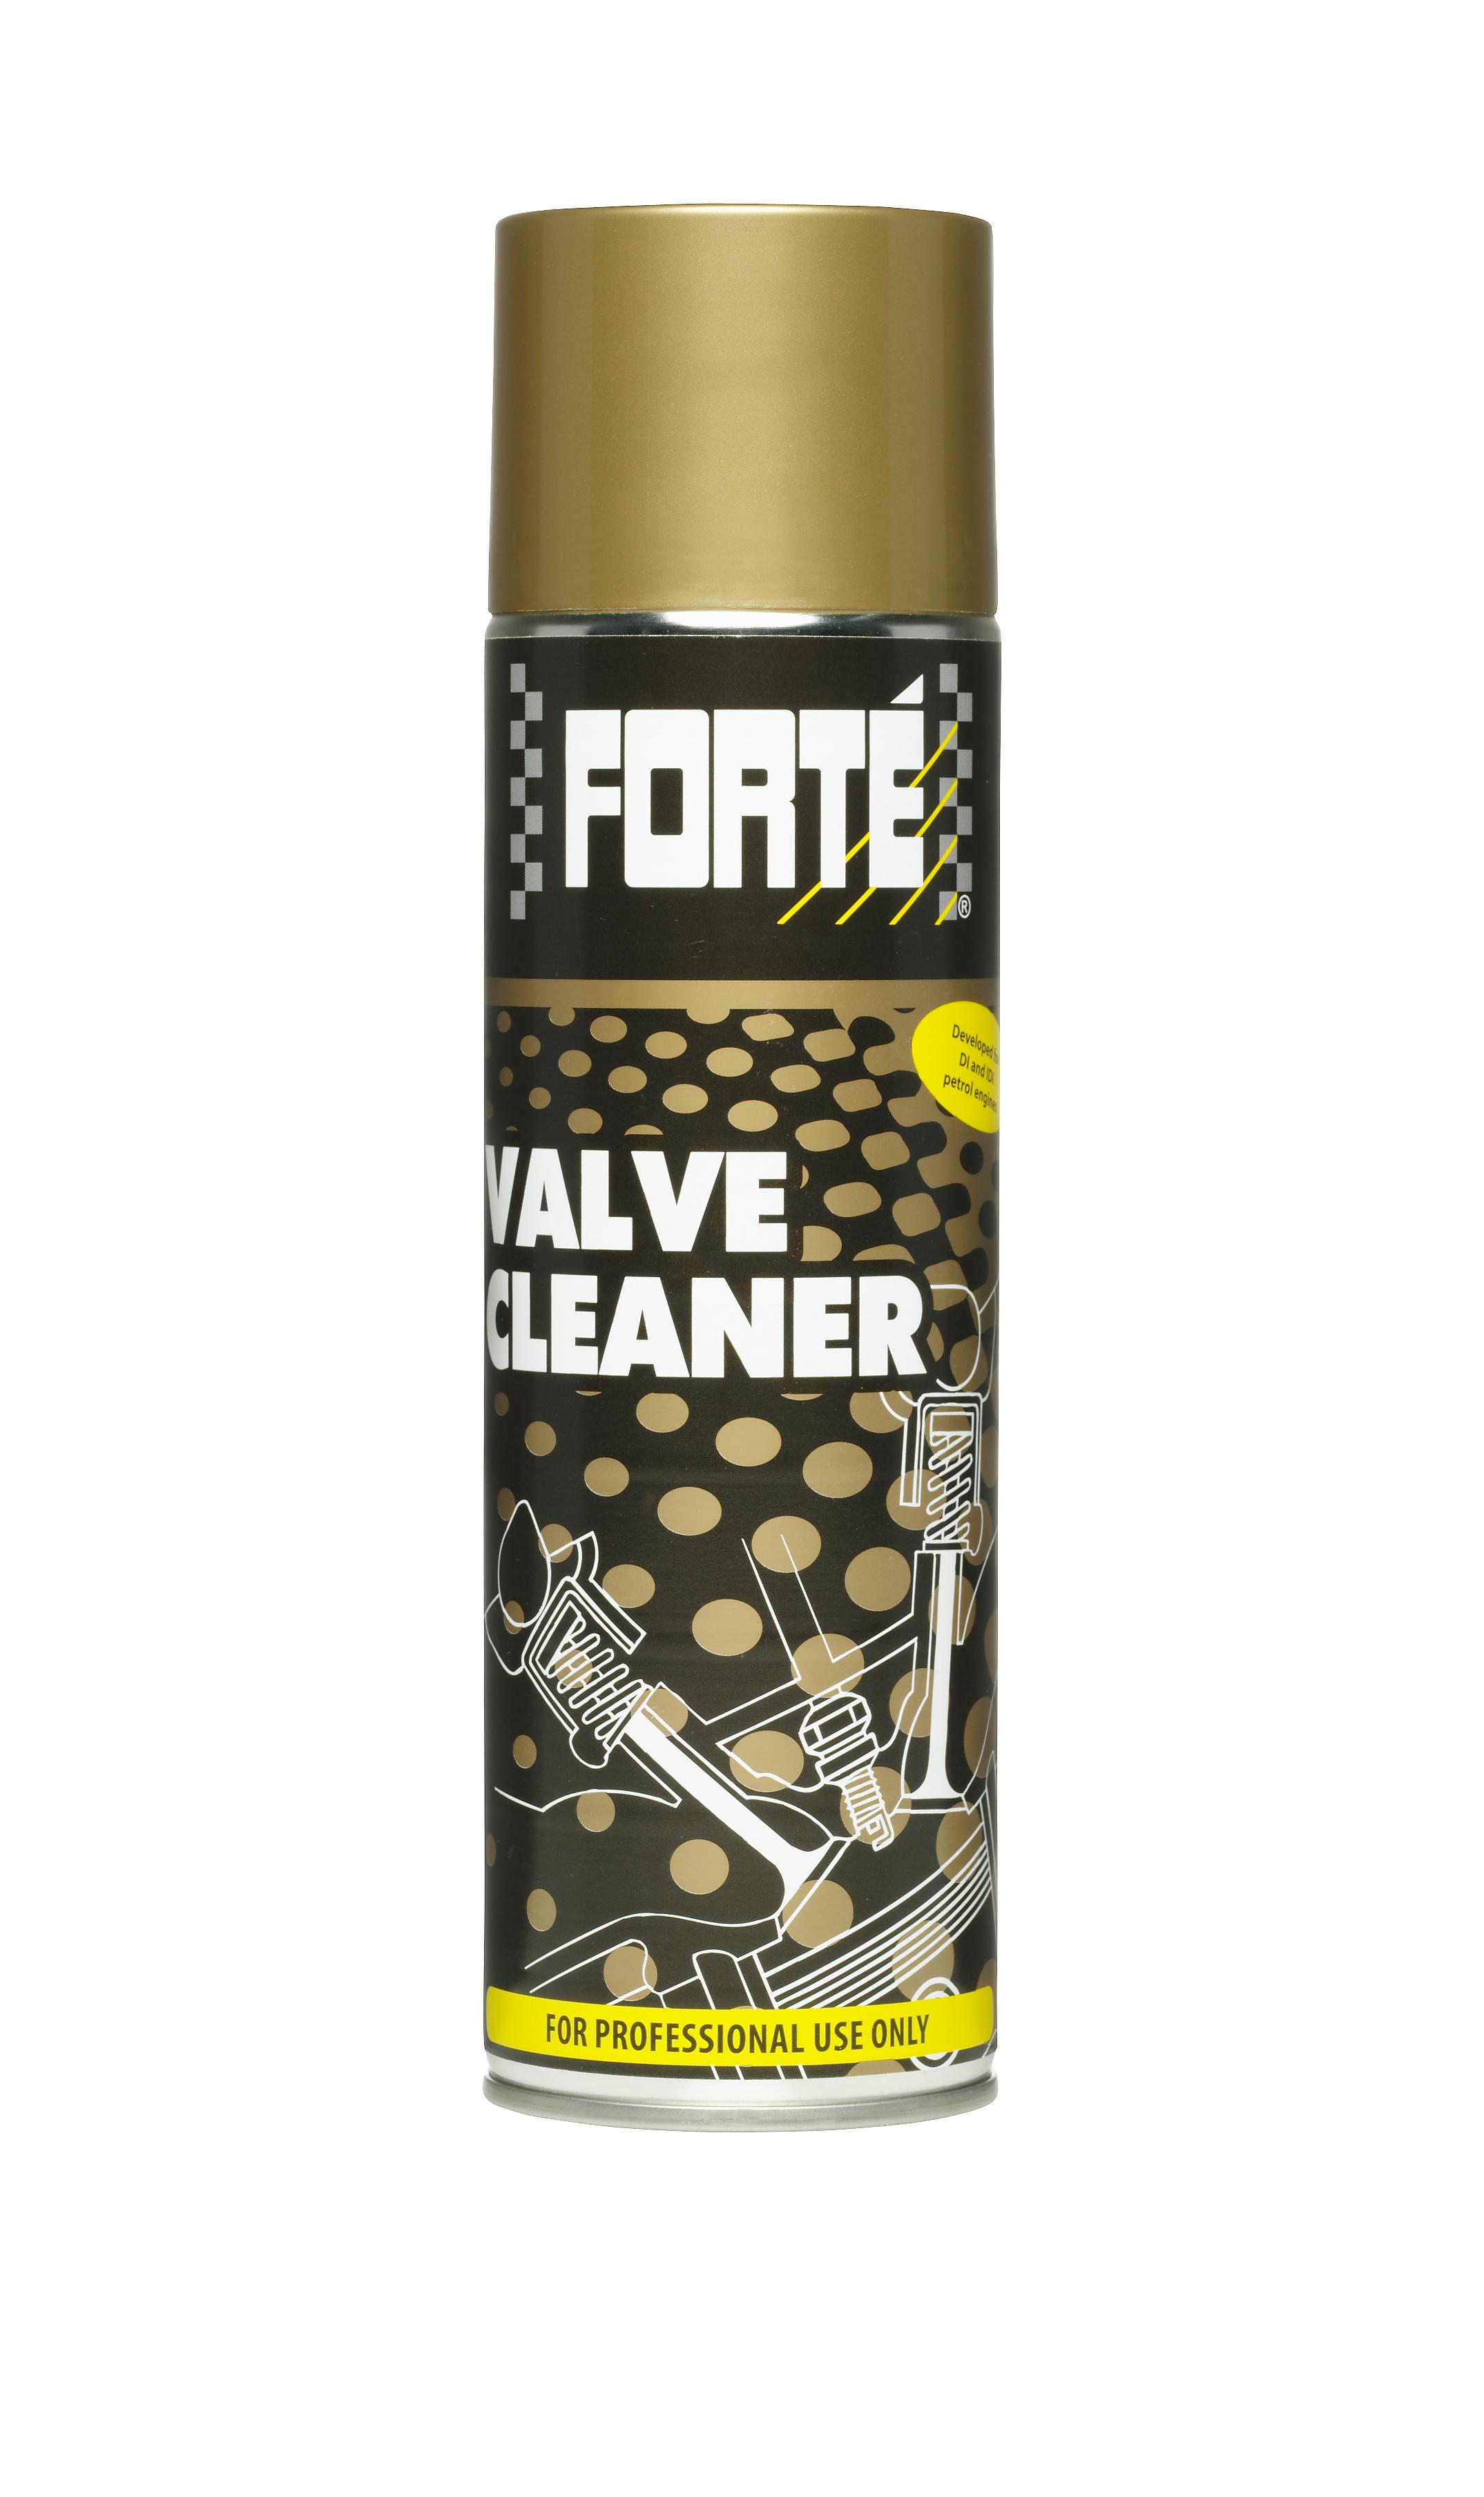 Zawory ssące w silnikach benz. DI Forte Valve Cleaner